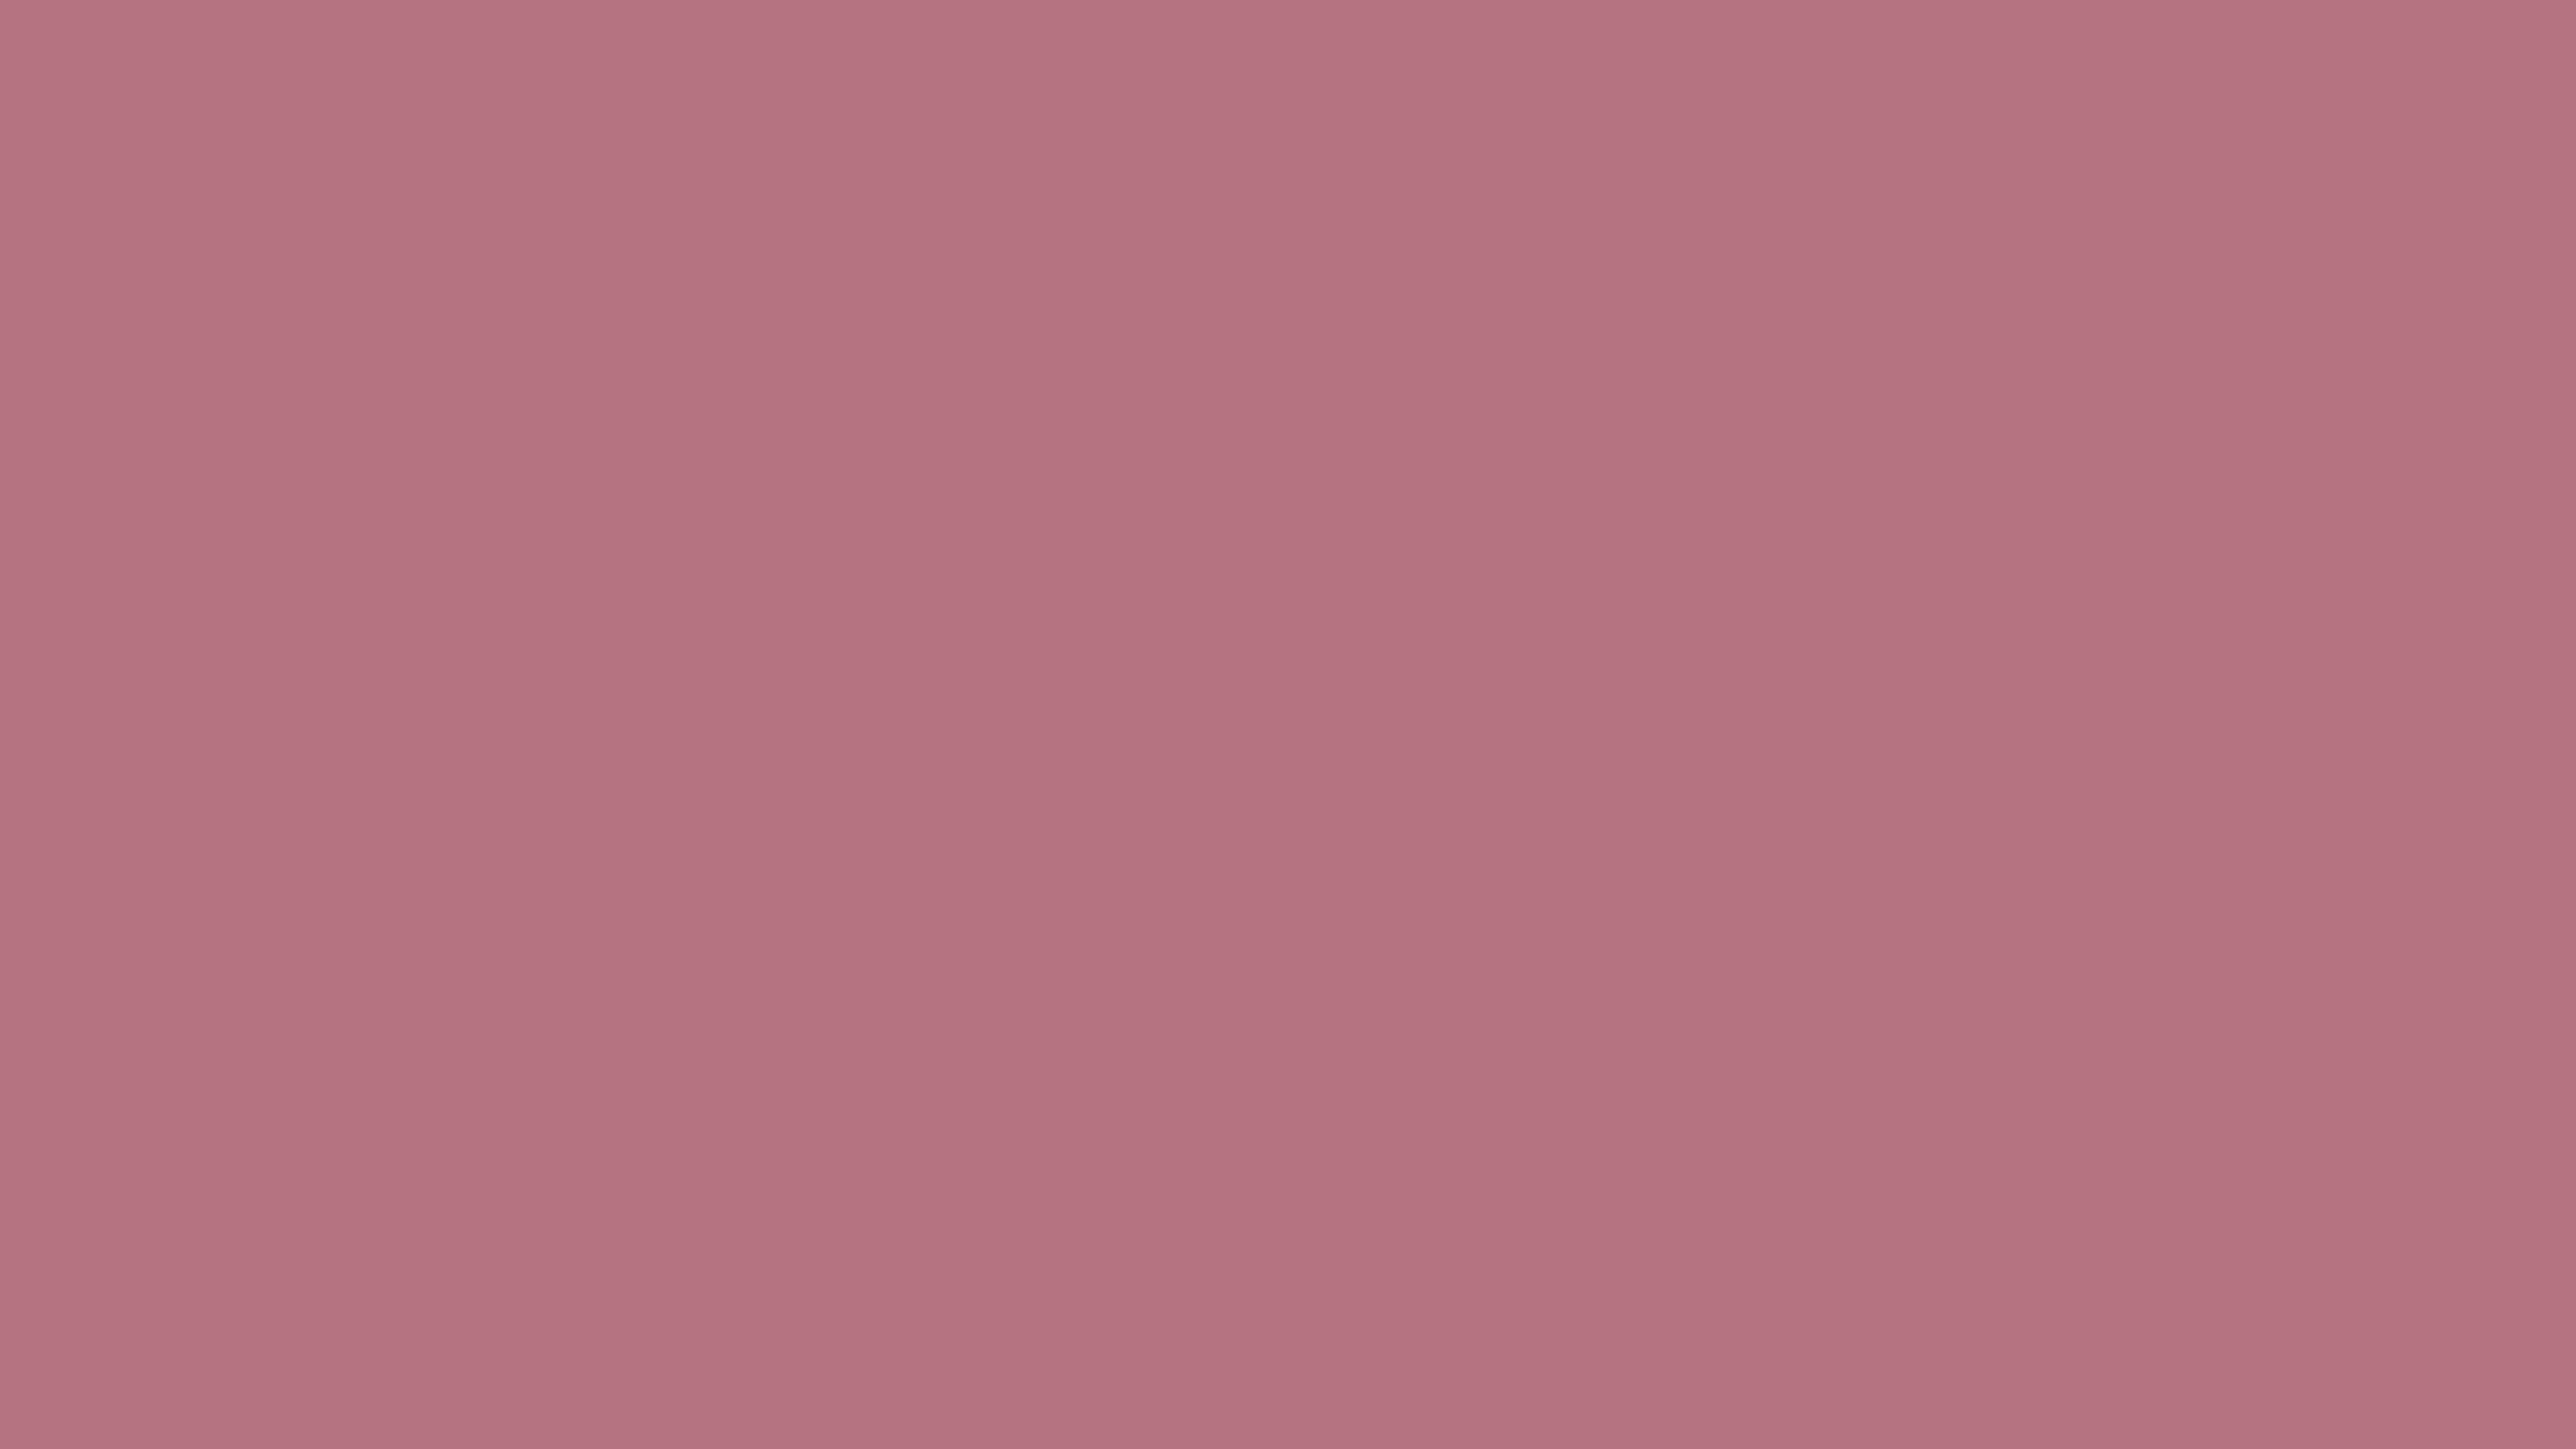 3840x2160 Turkish Rose Solid Color Background